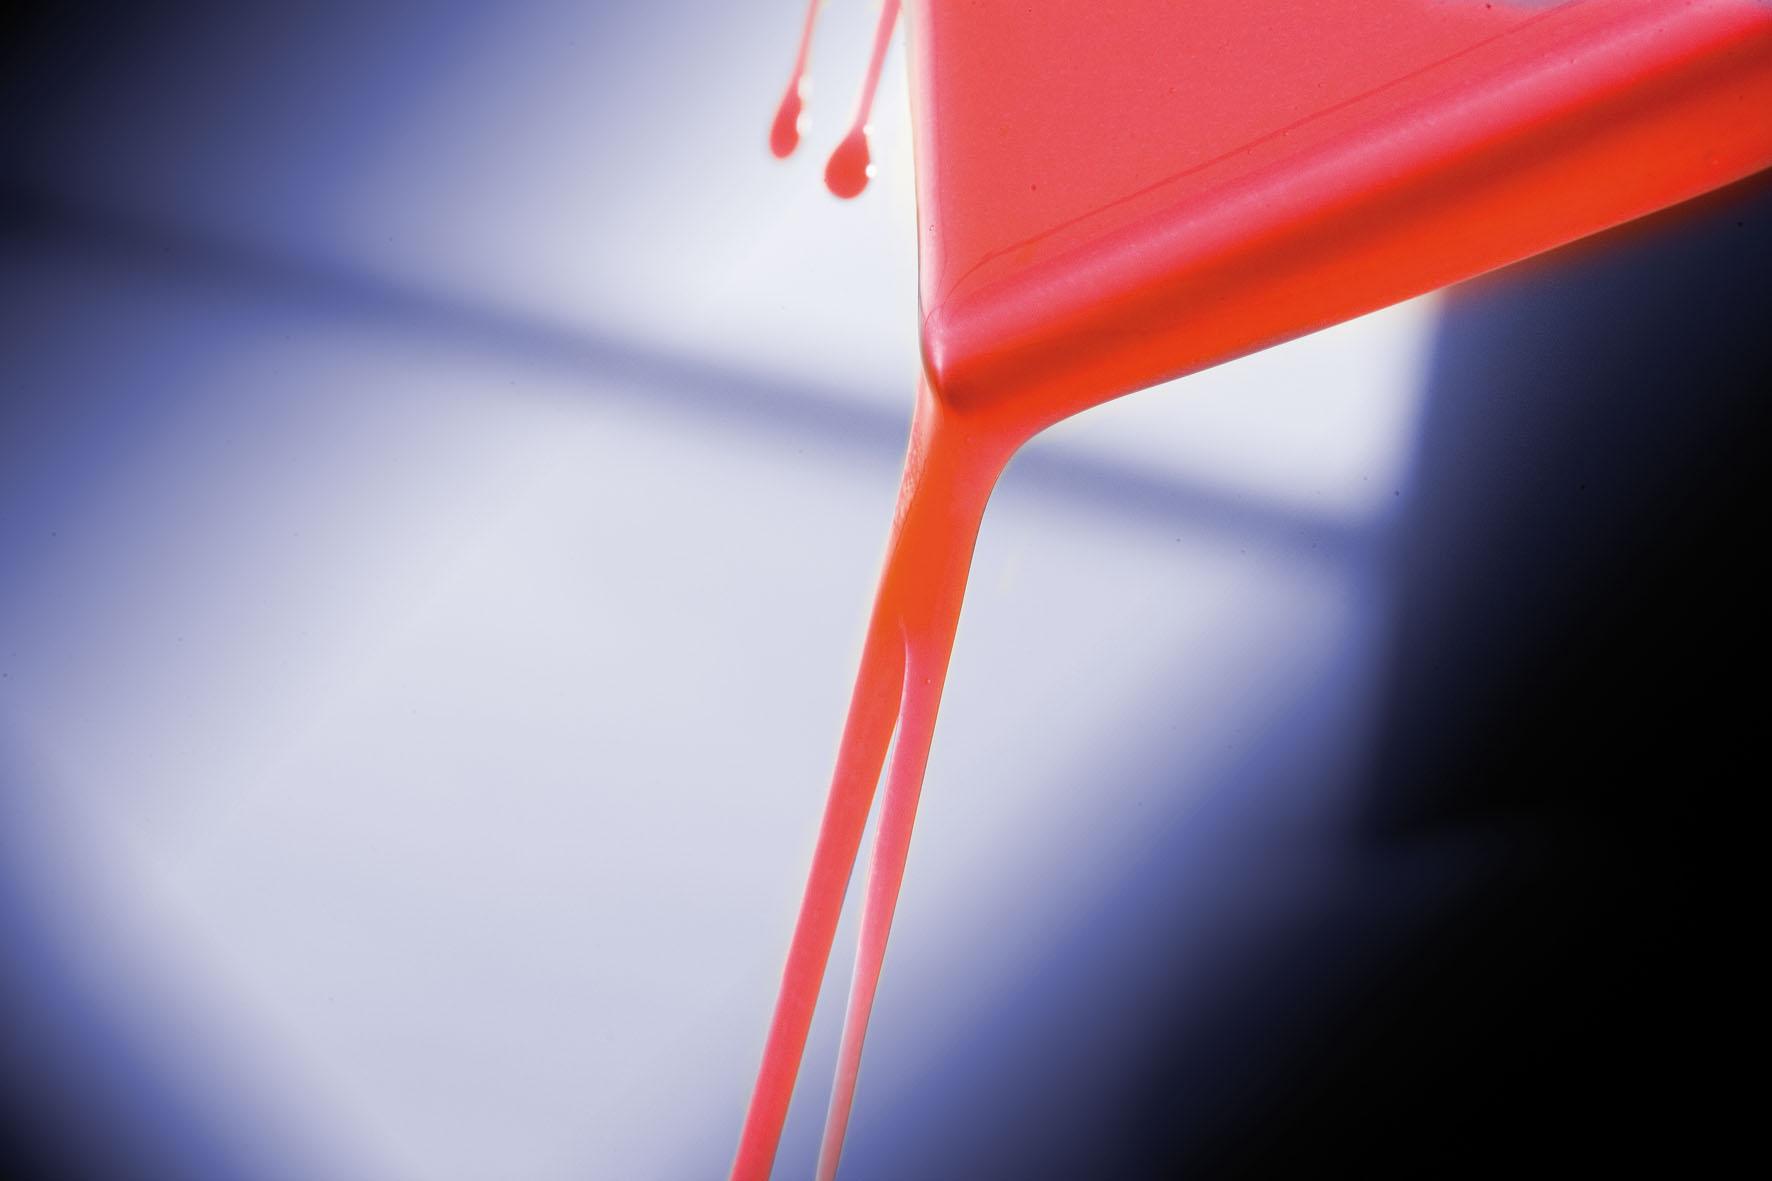 Rheology of coatings: flow point determination